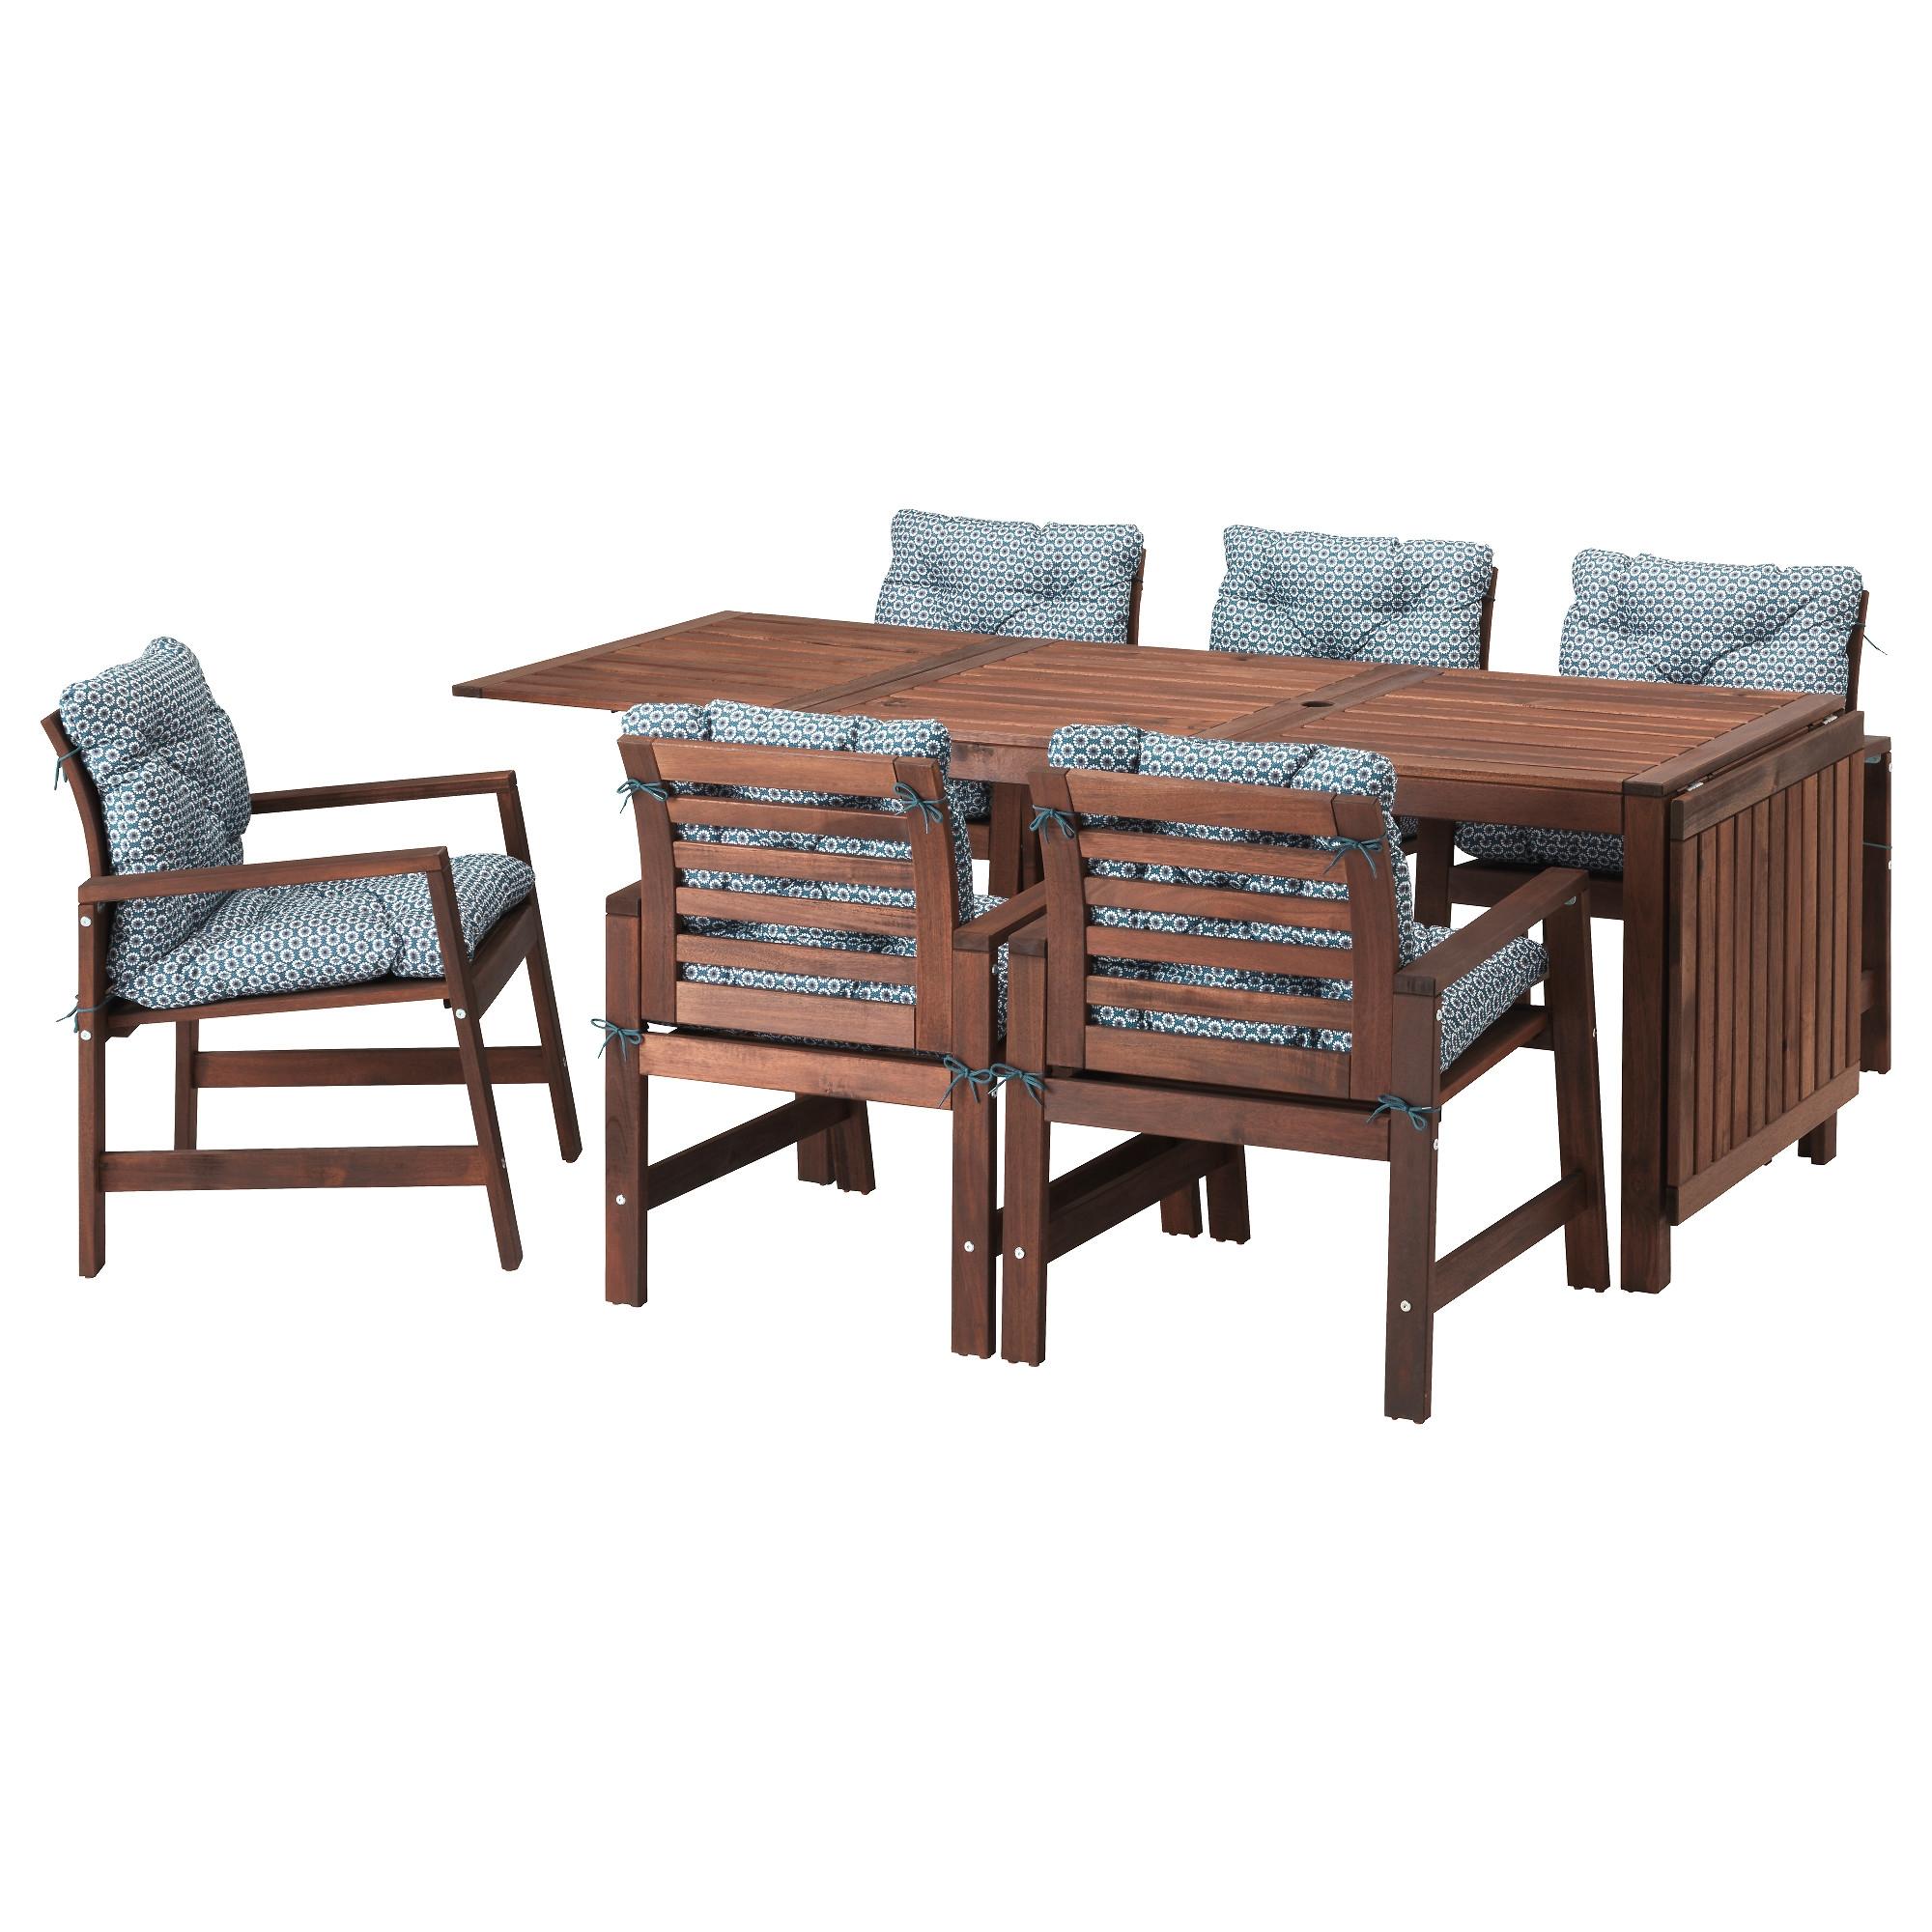 APPLARO Table 6 Chairs